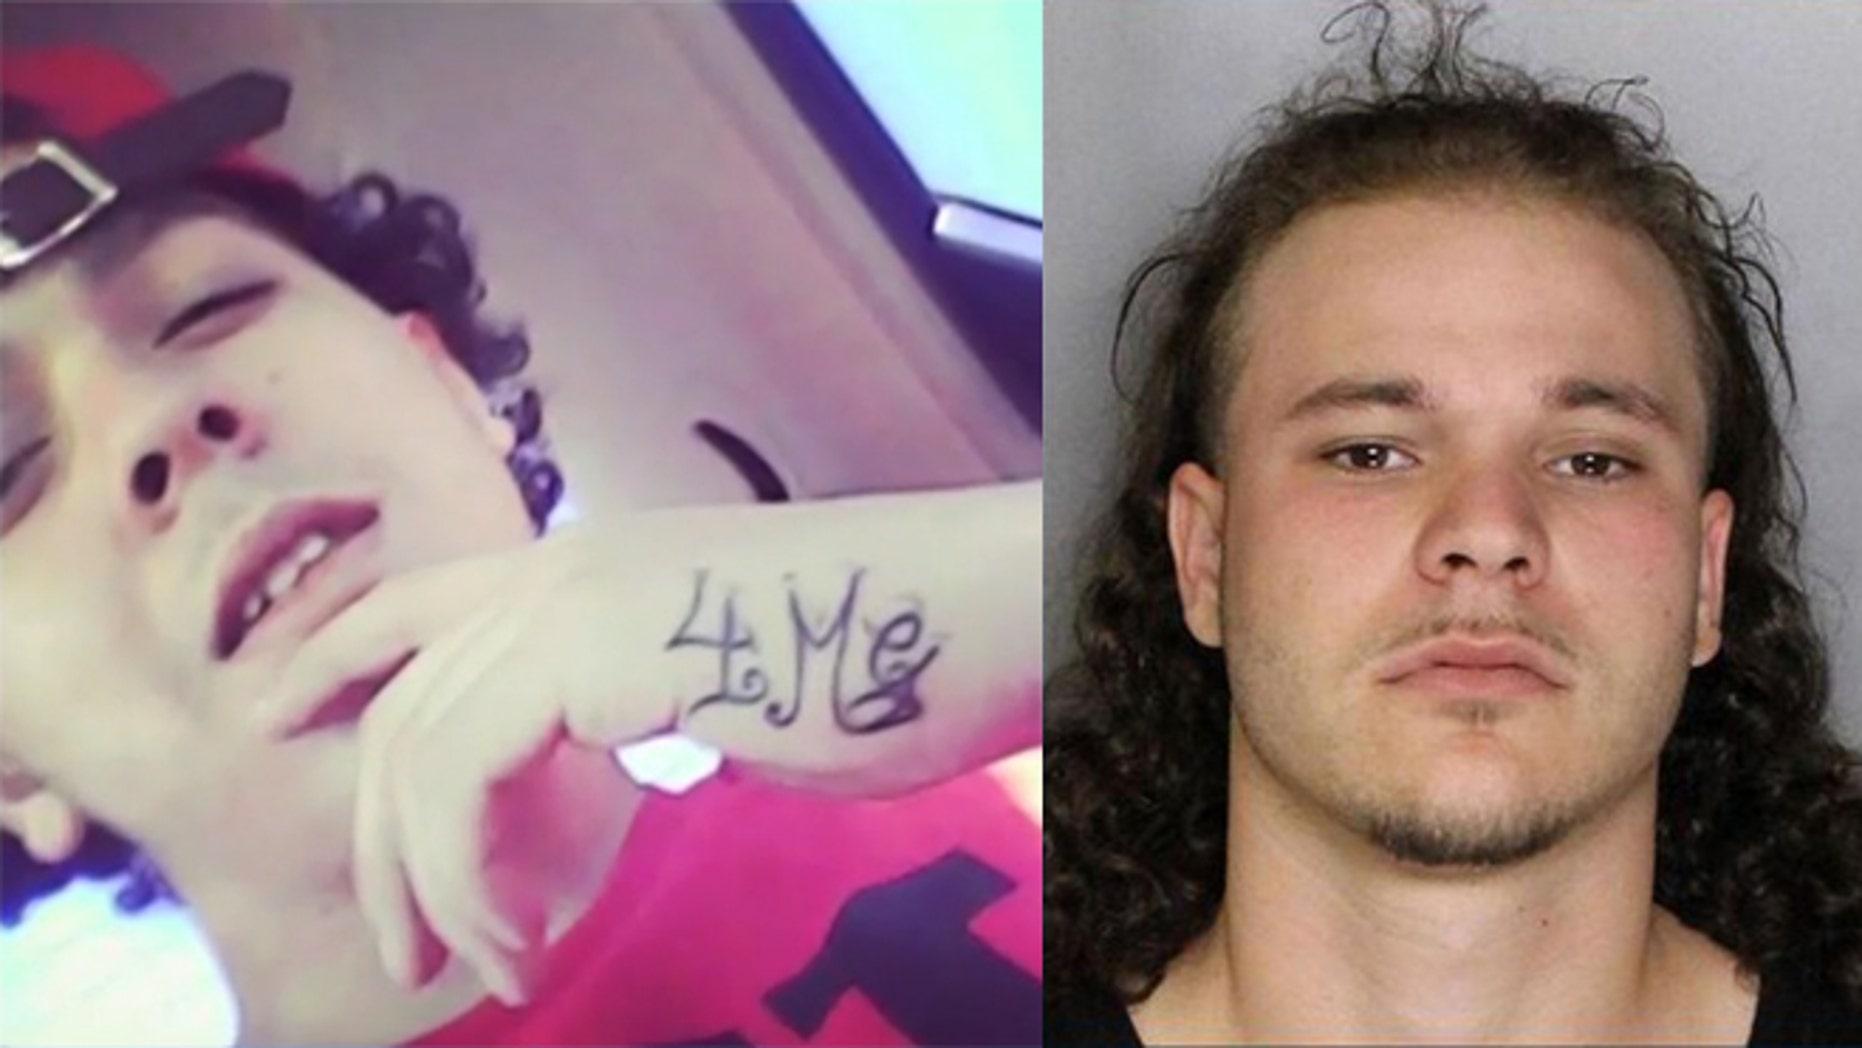 Left: Miguel Martinez (Photo: Via Facebook). Right: Elijah Lambert (Photo: Sacramento County Sheriff's Department)